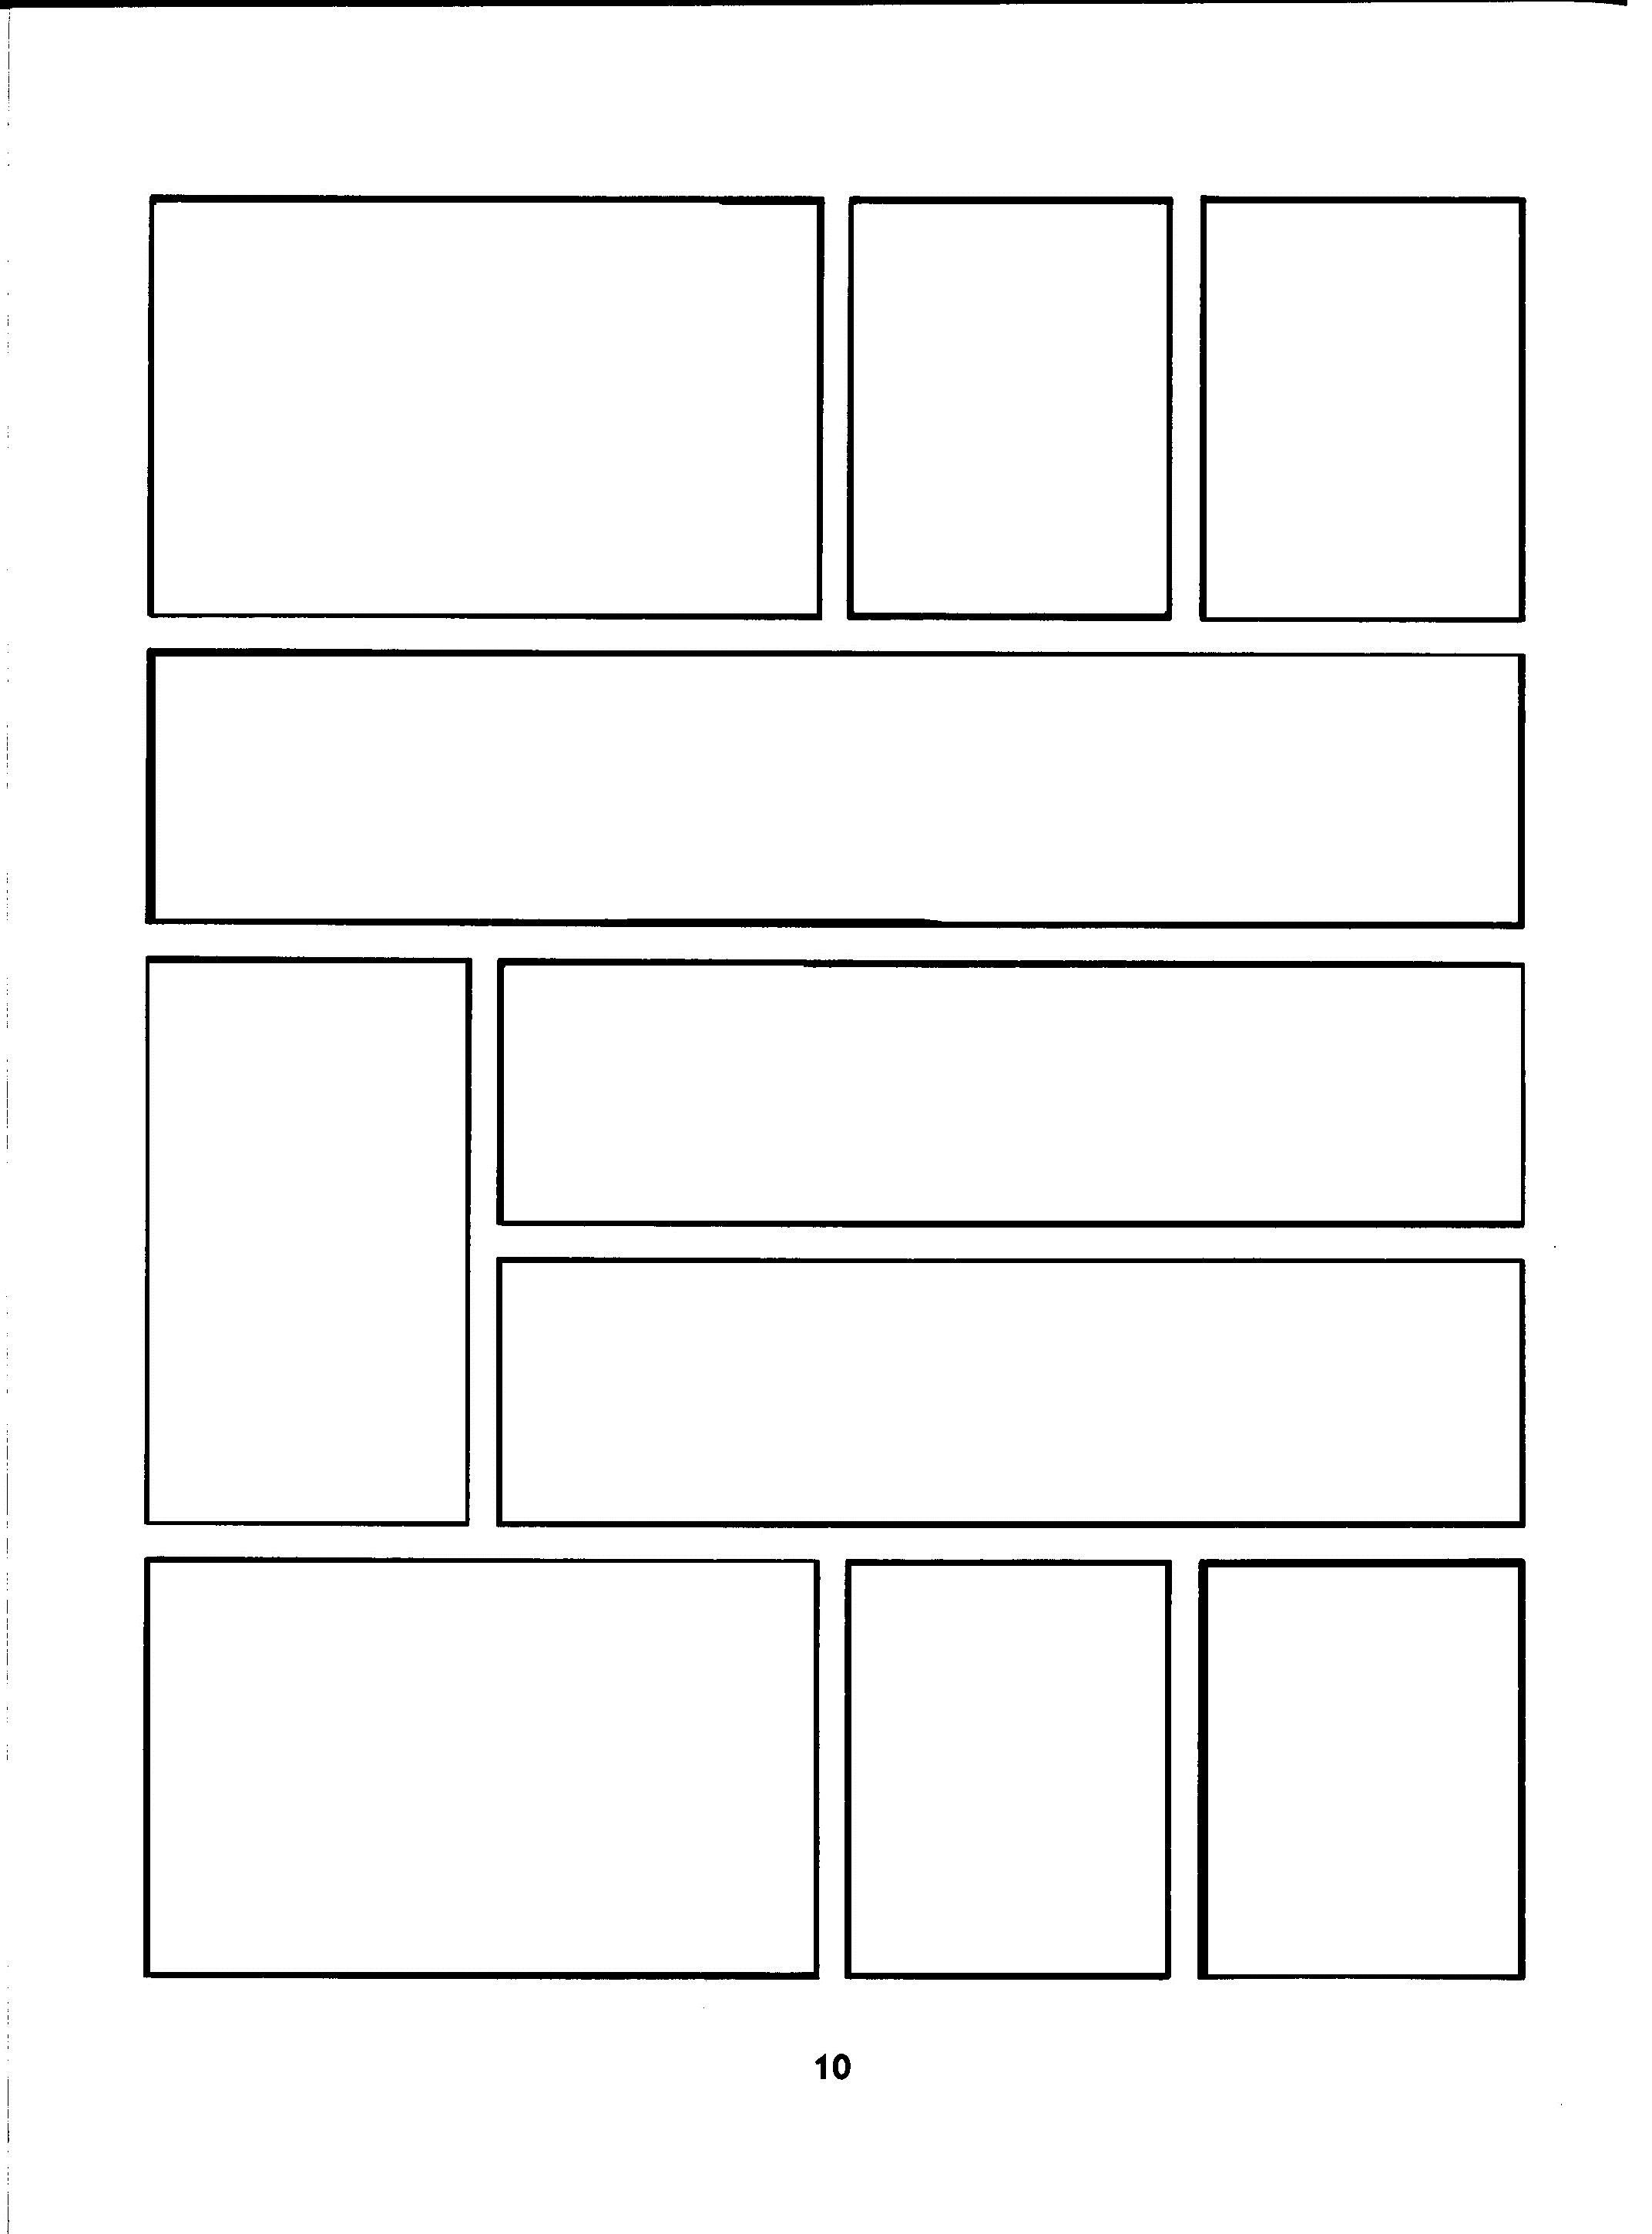 002 Wondrou Comic Strip Layout For Word Inspiration  Book Script Template Microsoft DocFull